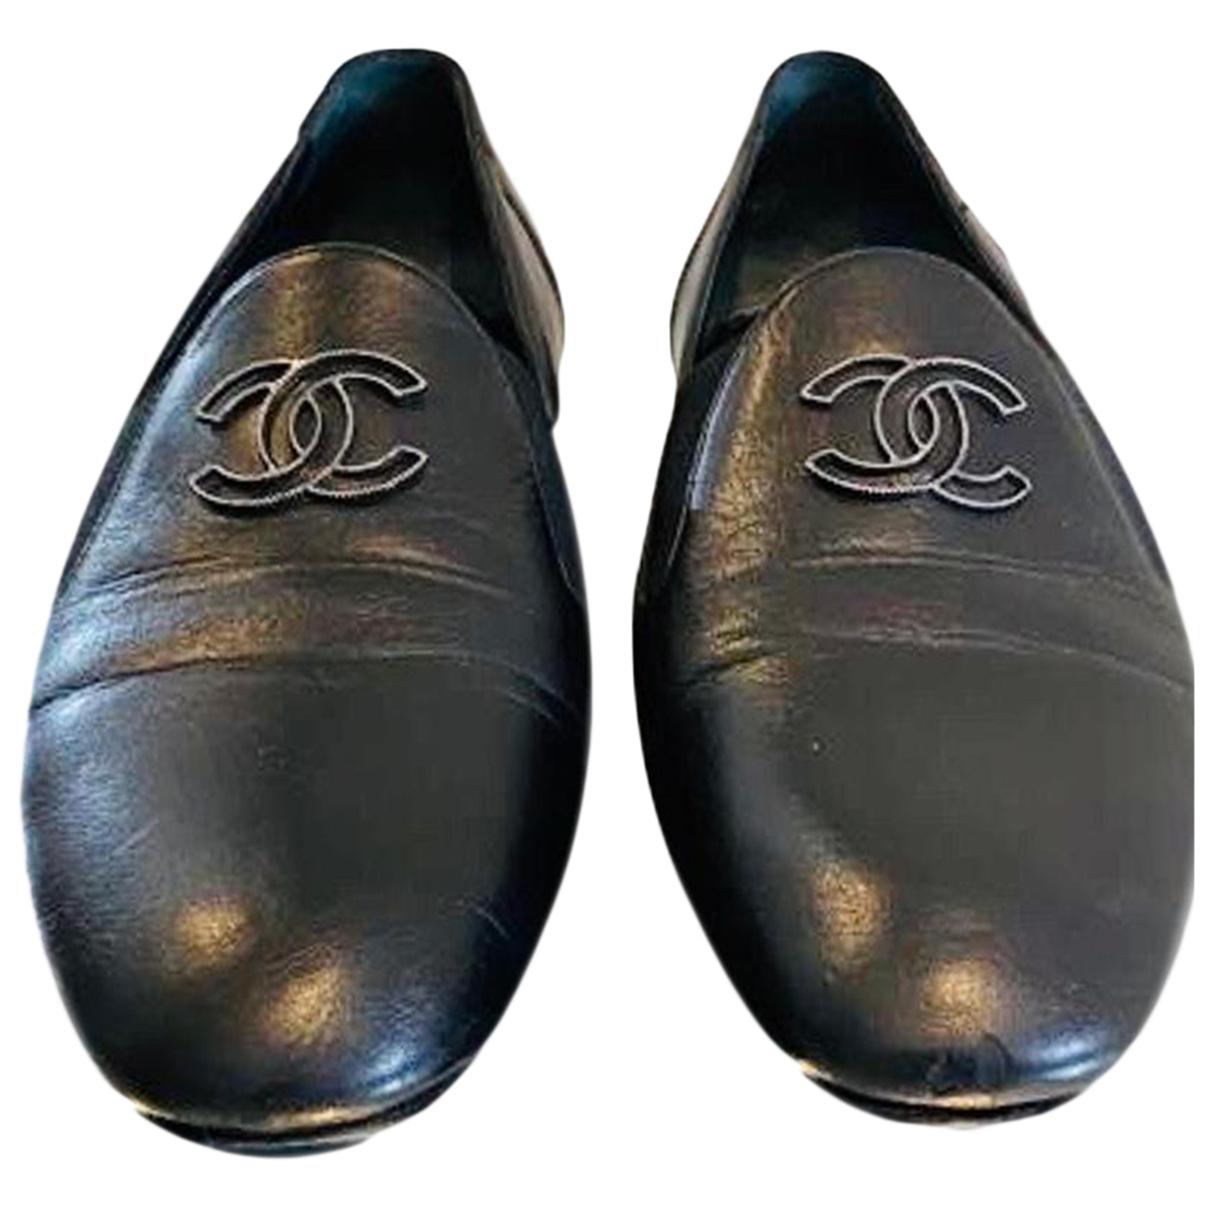 Chanel \N Black Leather Flats for Women 38.5 EU